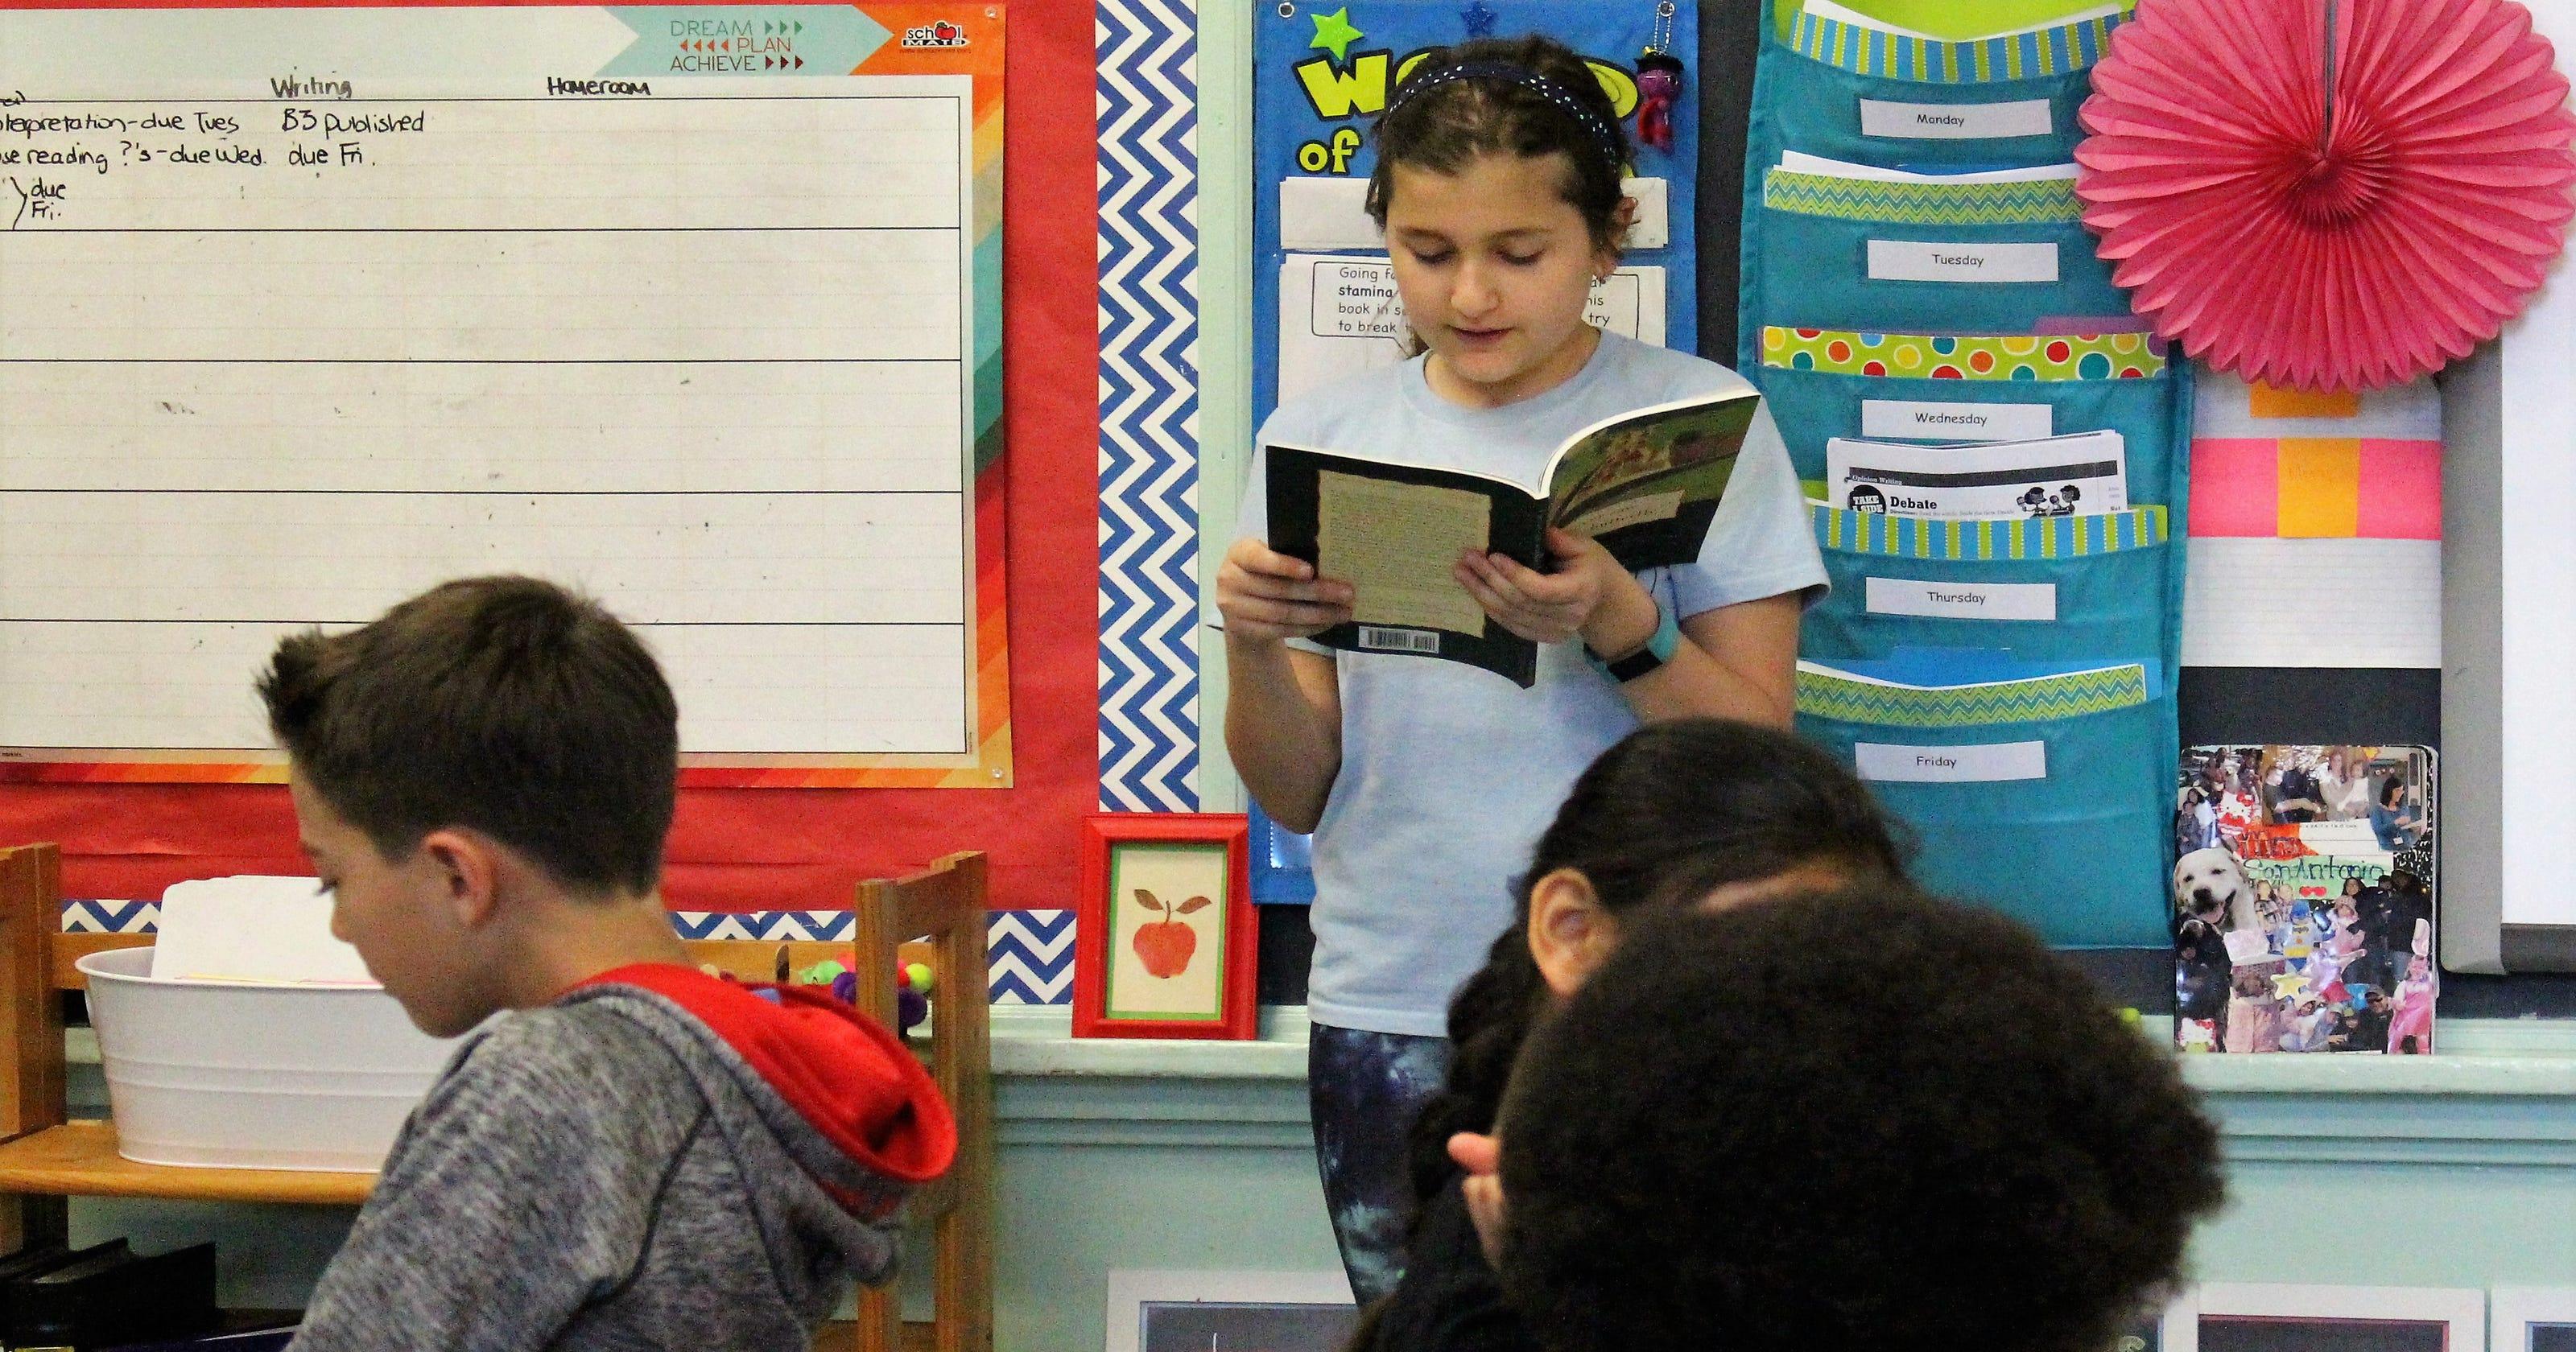 zimmer in grade school poem analysis